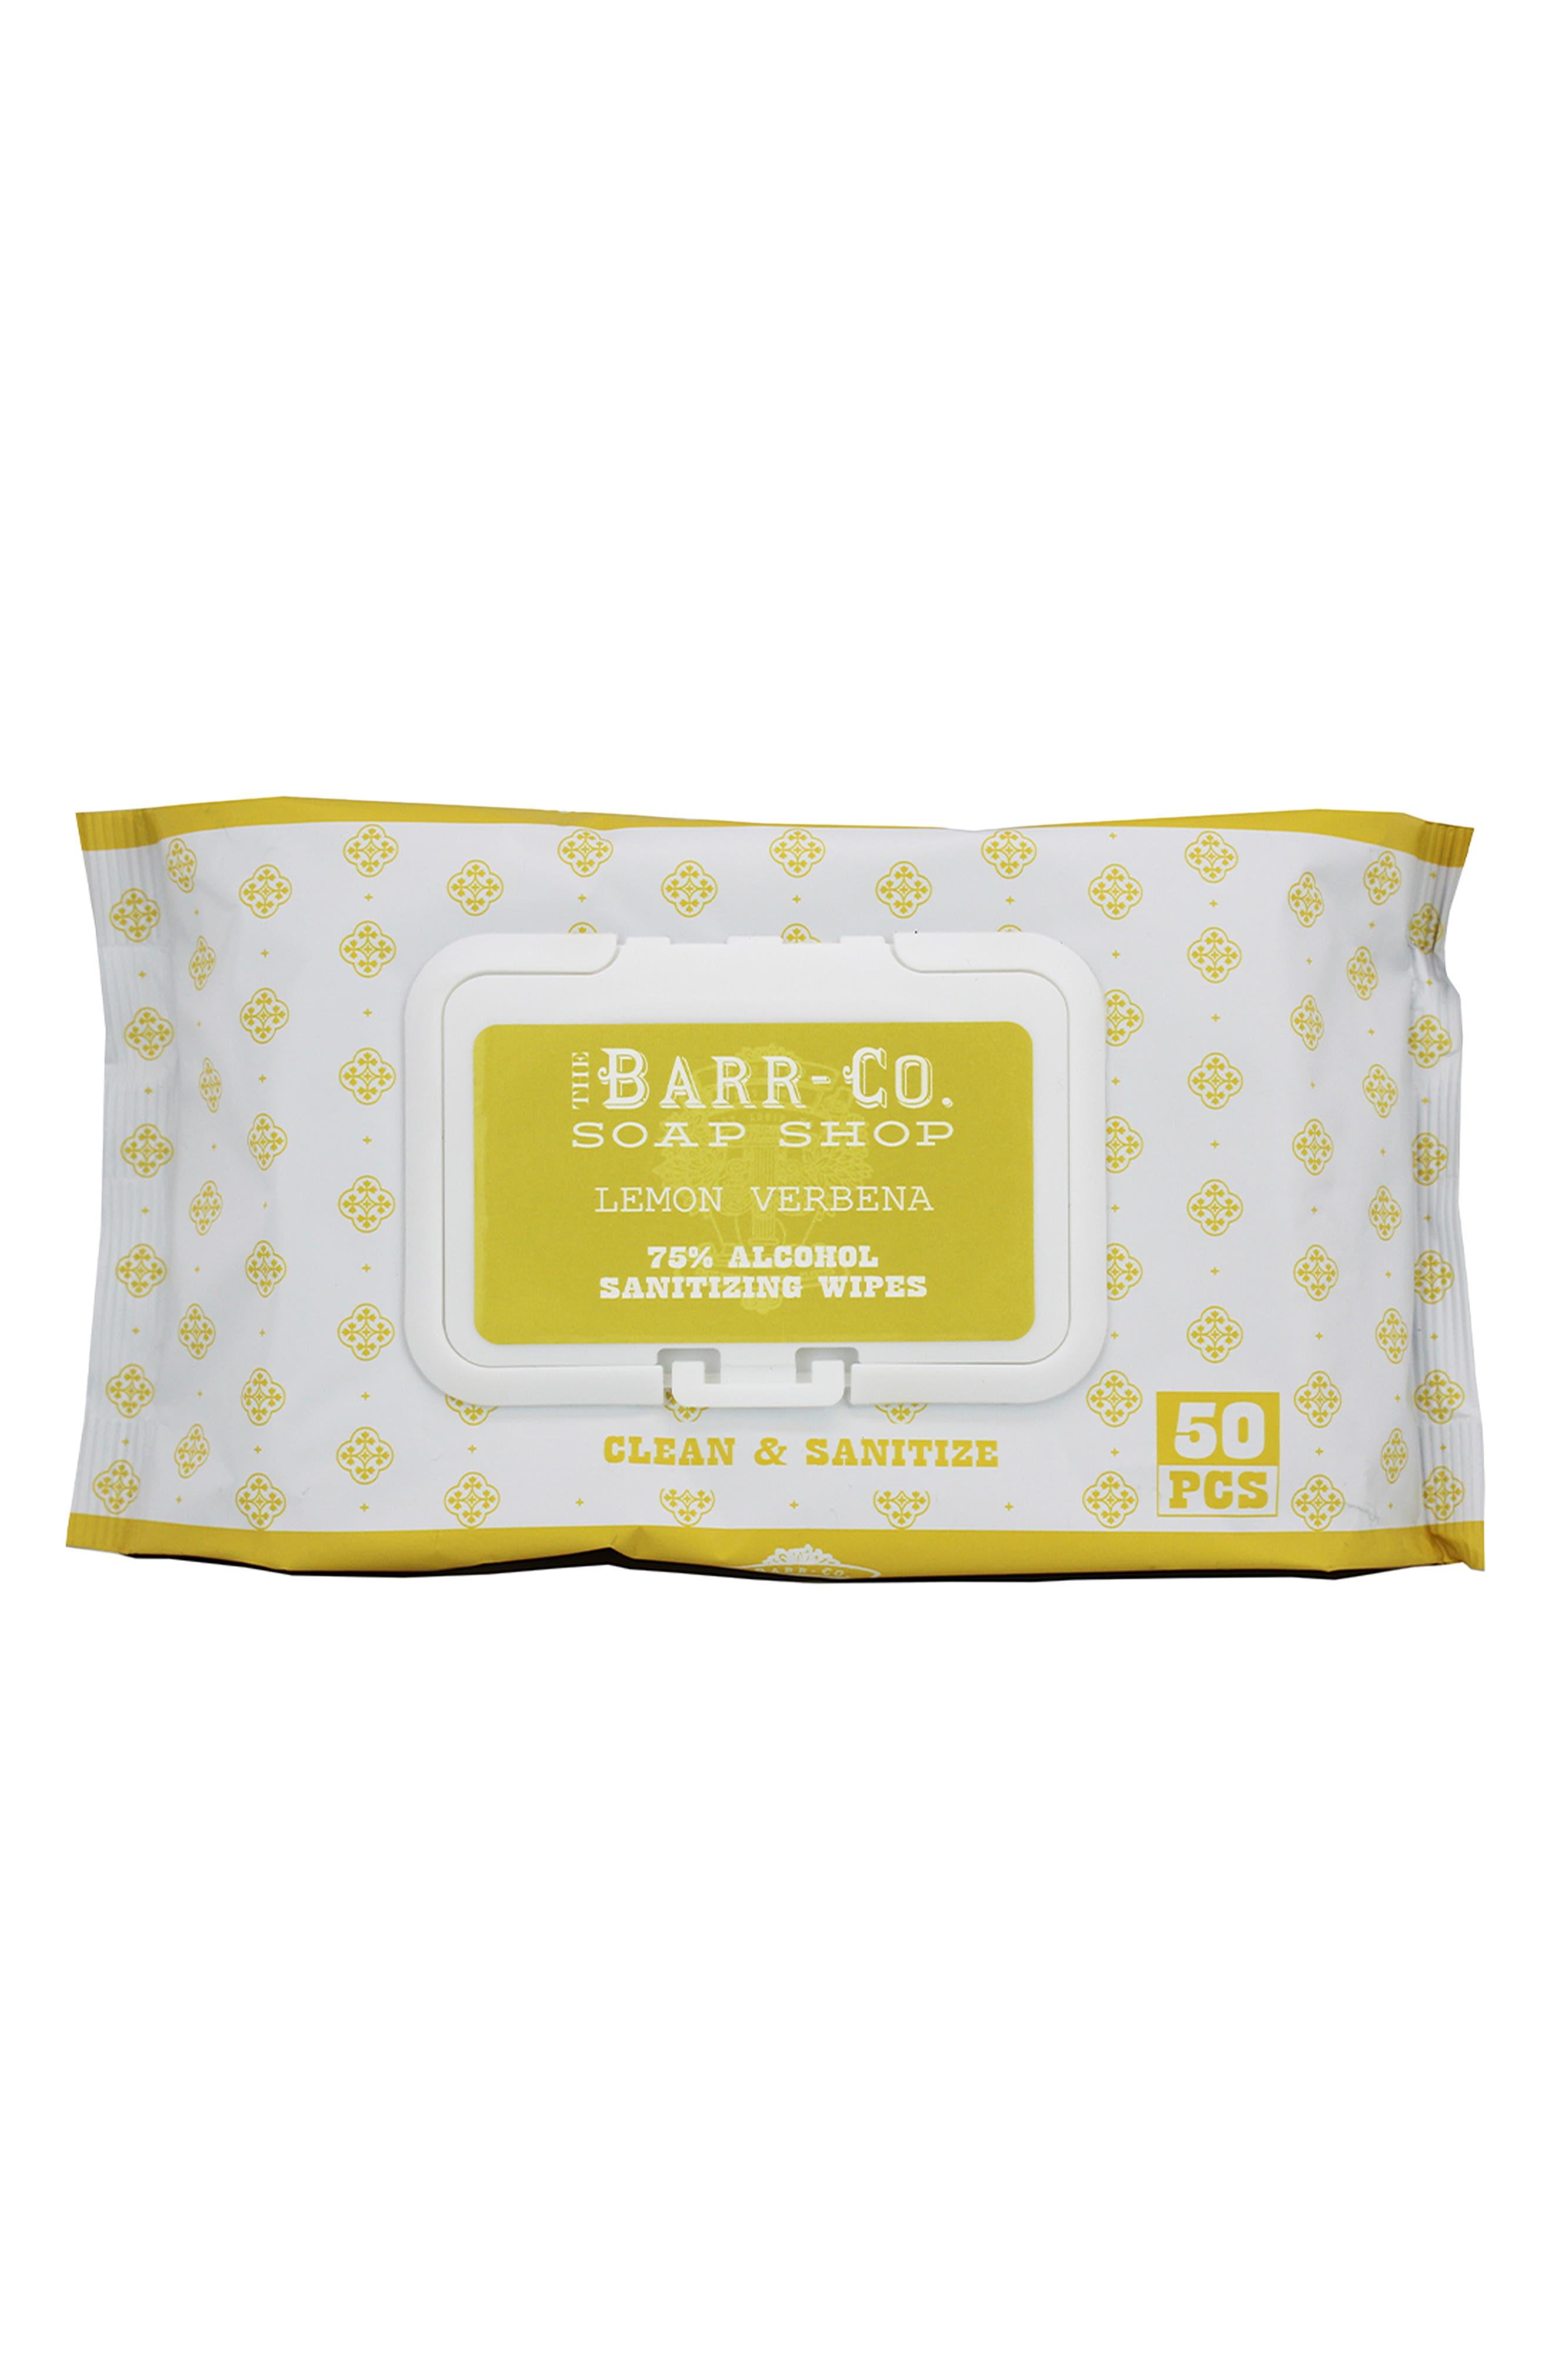 Lemon Verbena 75% Alcohol Sanitizing Wipes